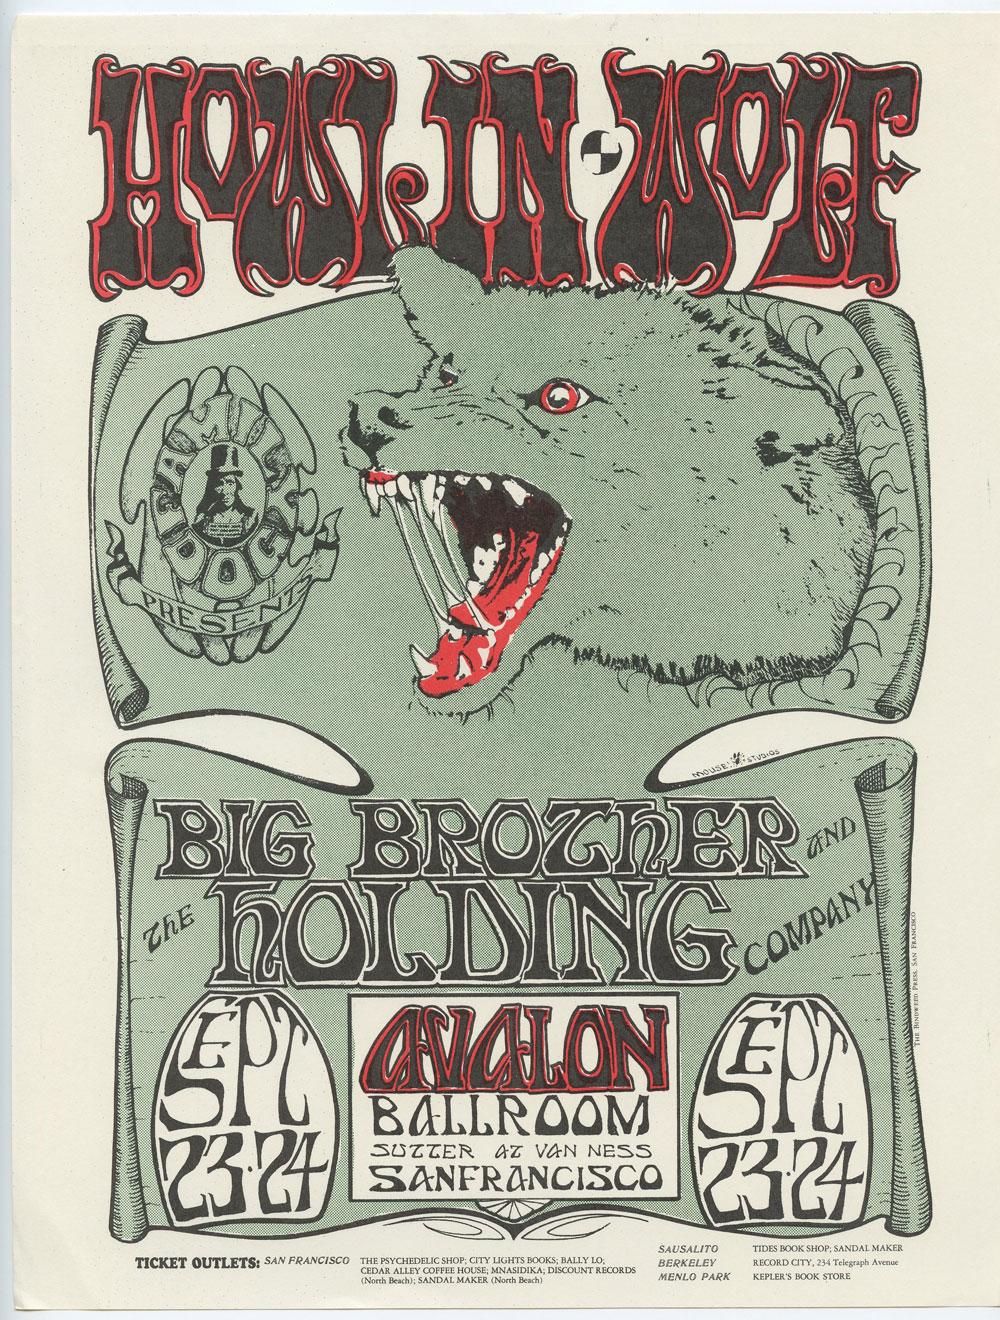 Family Dog  27 Handbill Howlin' Wolf  Big Brother & the Holding Co 1966 Sep 23